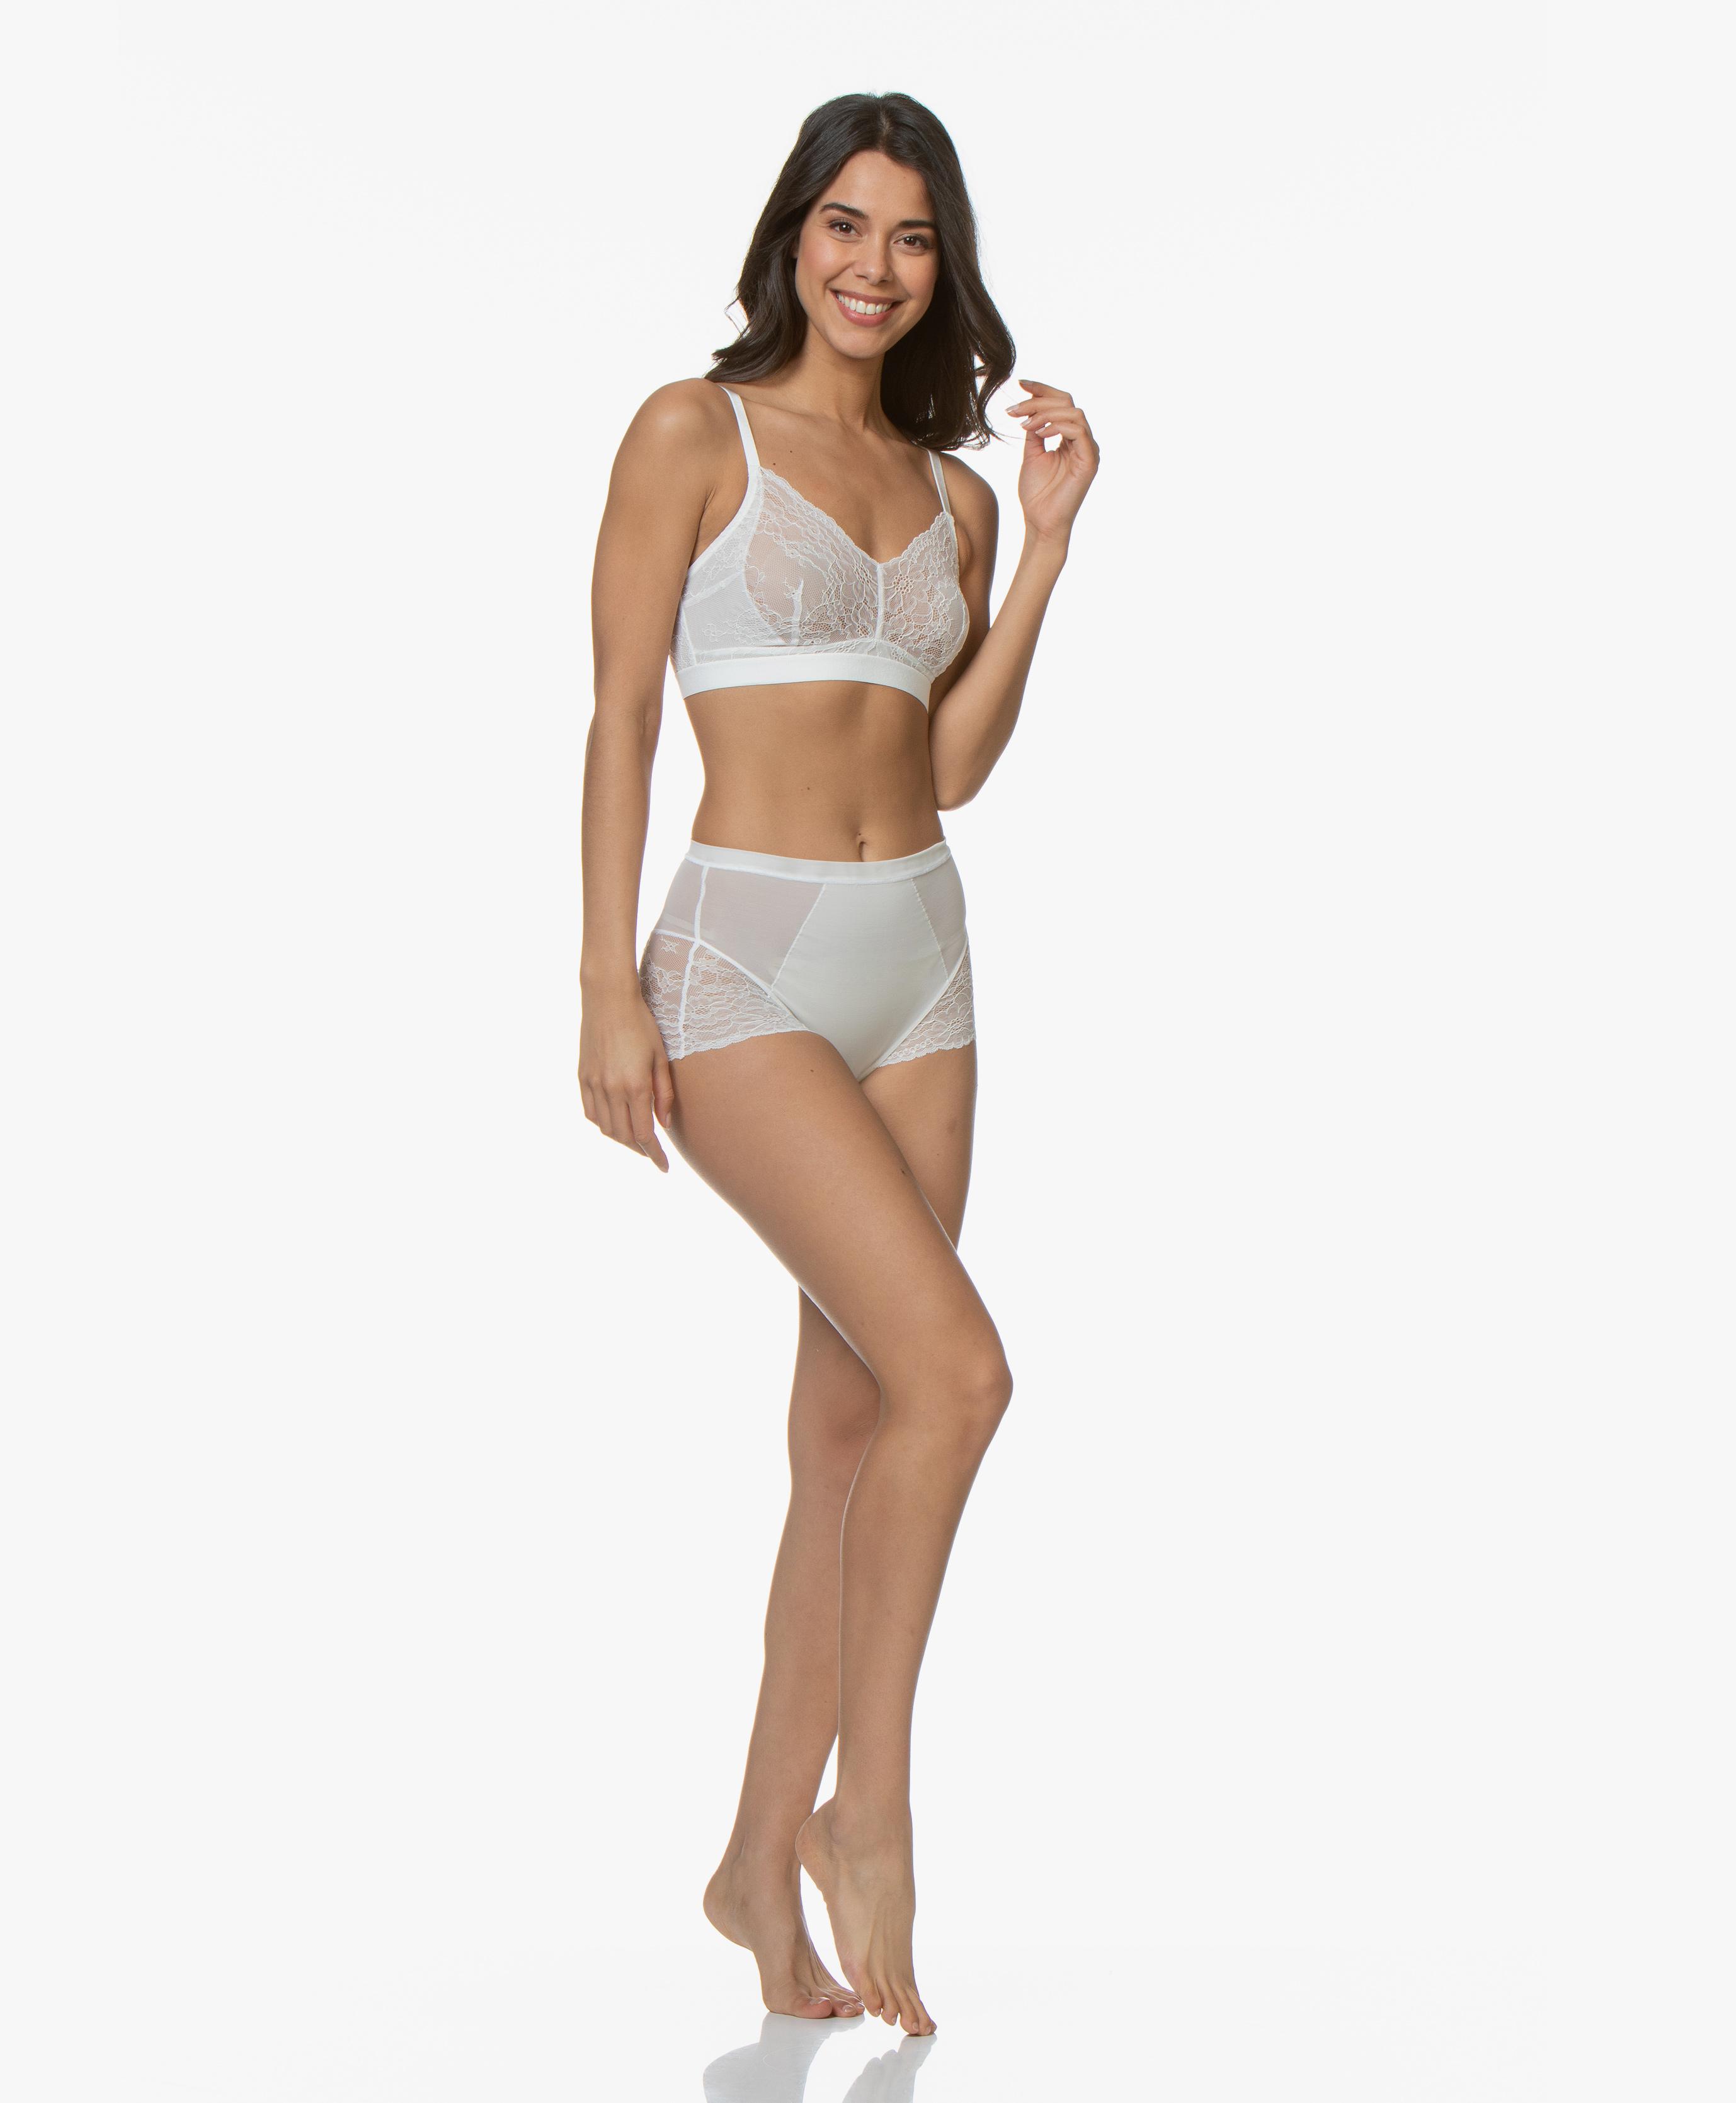 ec209238afa079 SPANX® Spotlight on Lace Bralette - Clean White - 10124r 1010 - clean